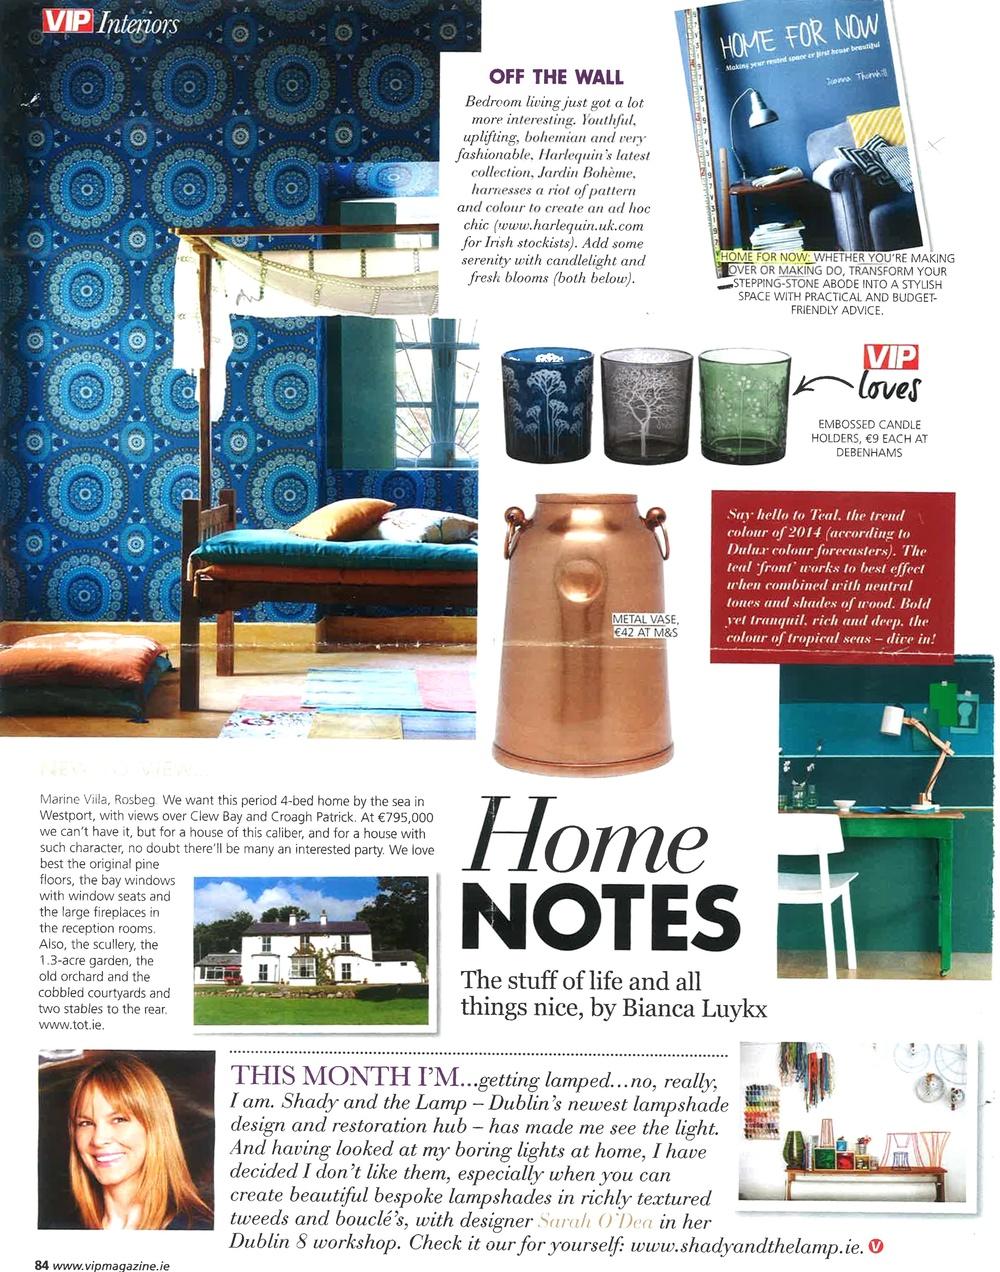 VIP magazine, April 2014